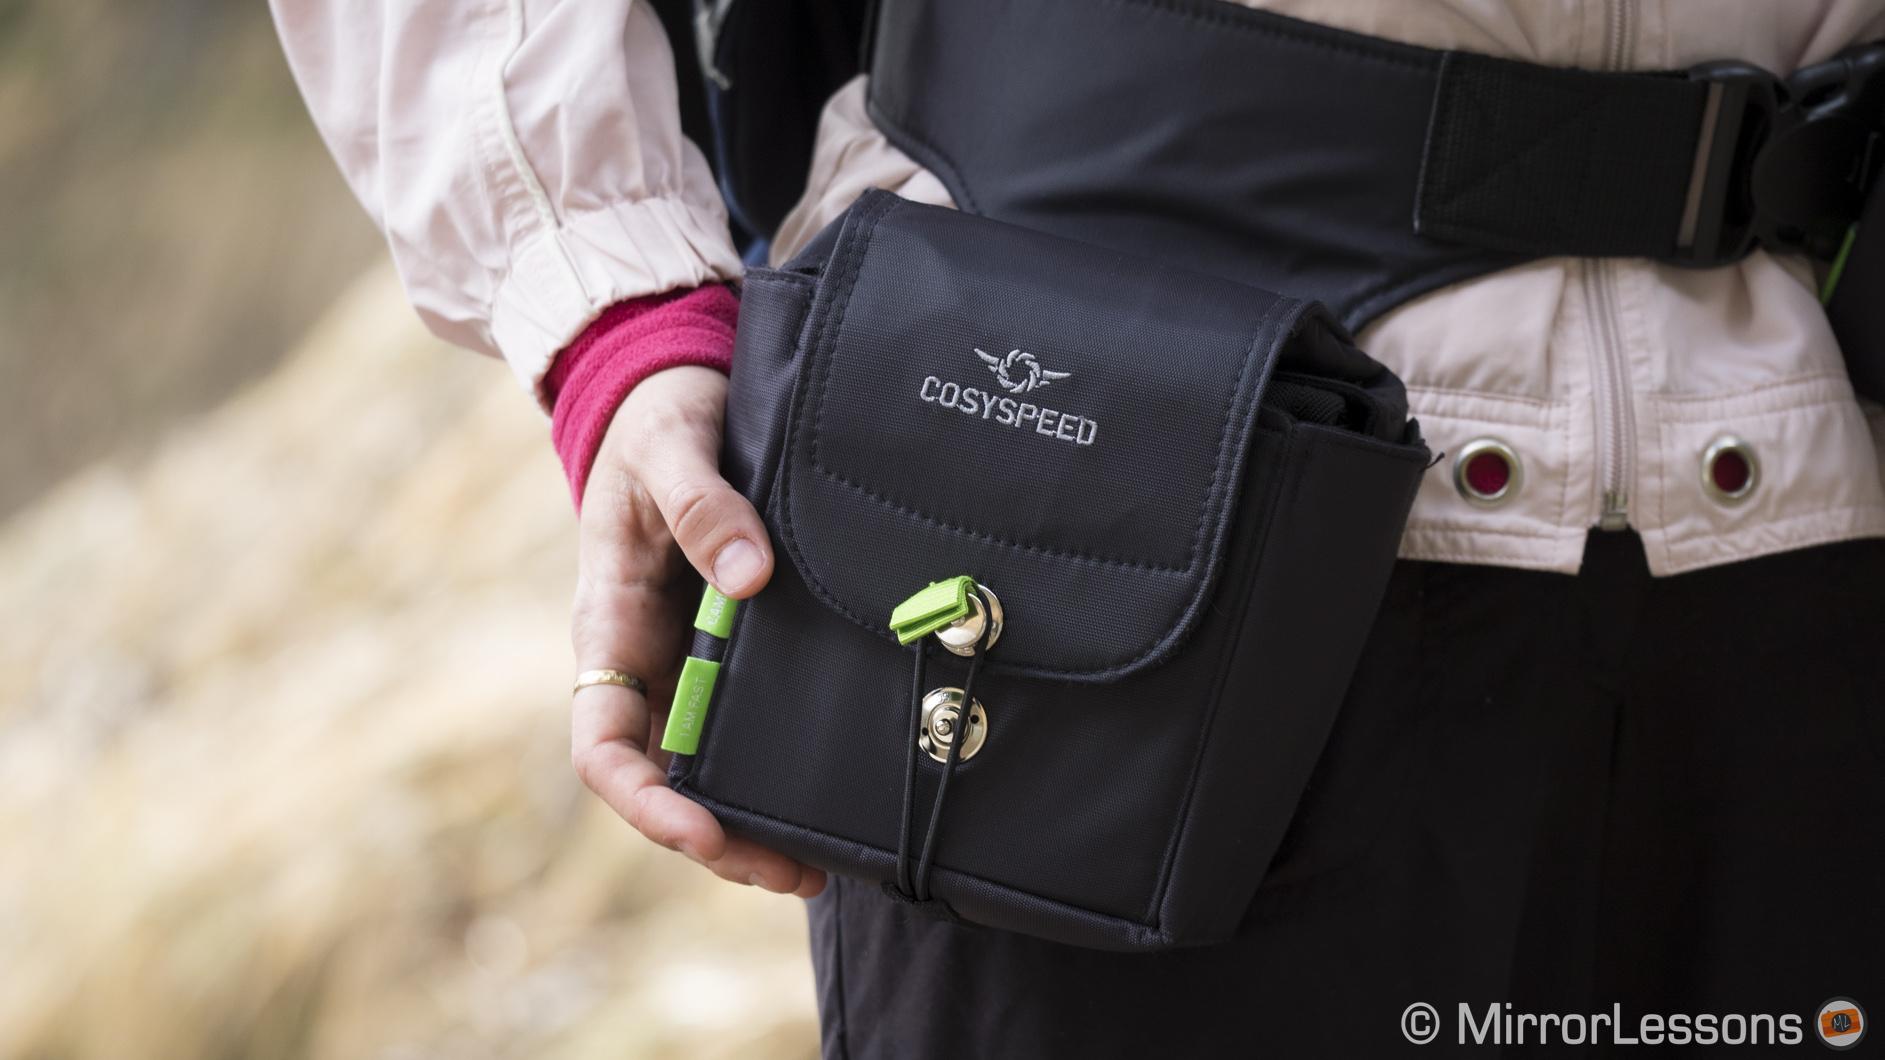 Mirrorless cameras belong to Cosyspeed camera bags